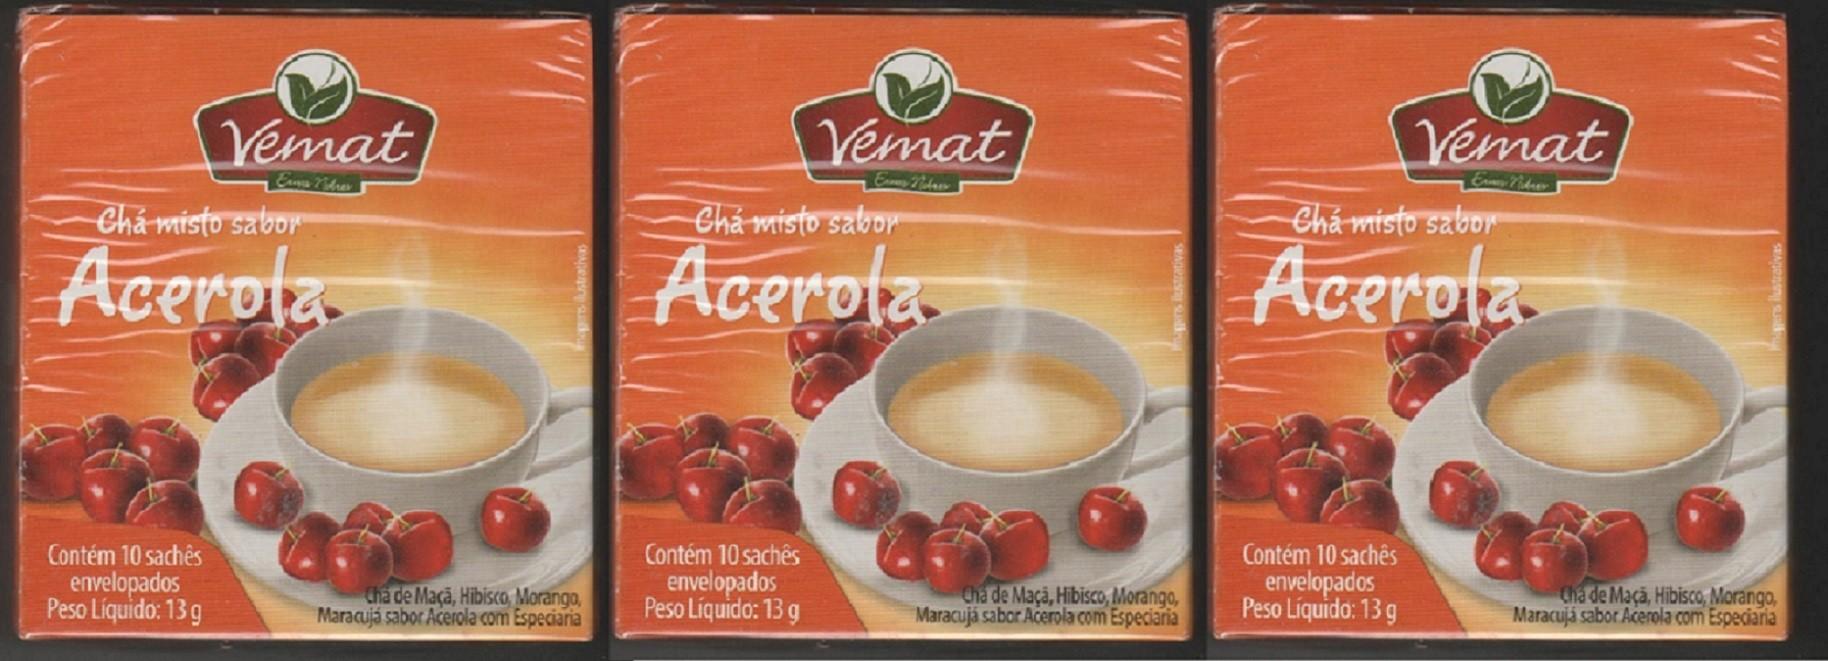 Cha Frutado Acerola 10 Saches Vemat 3 caixas